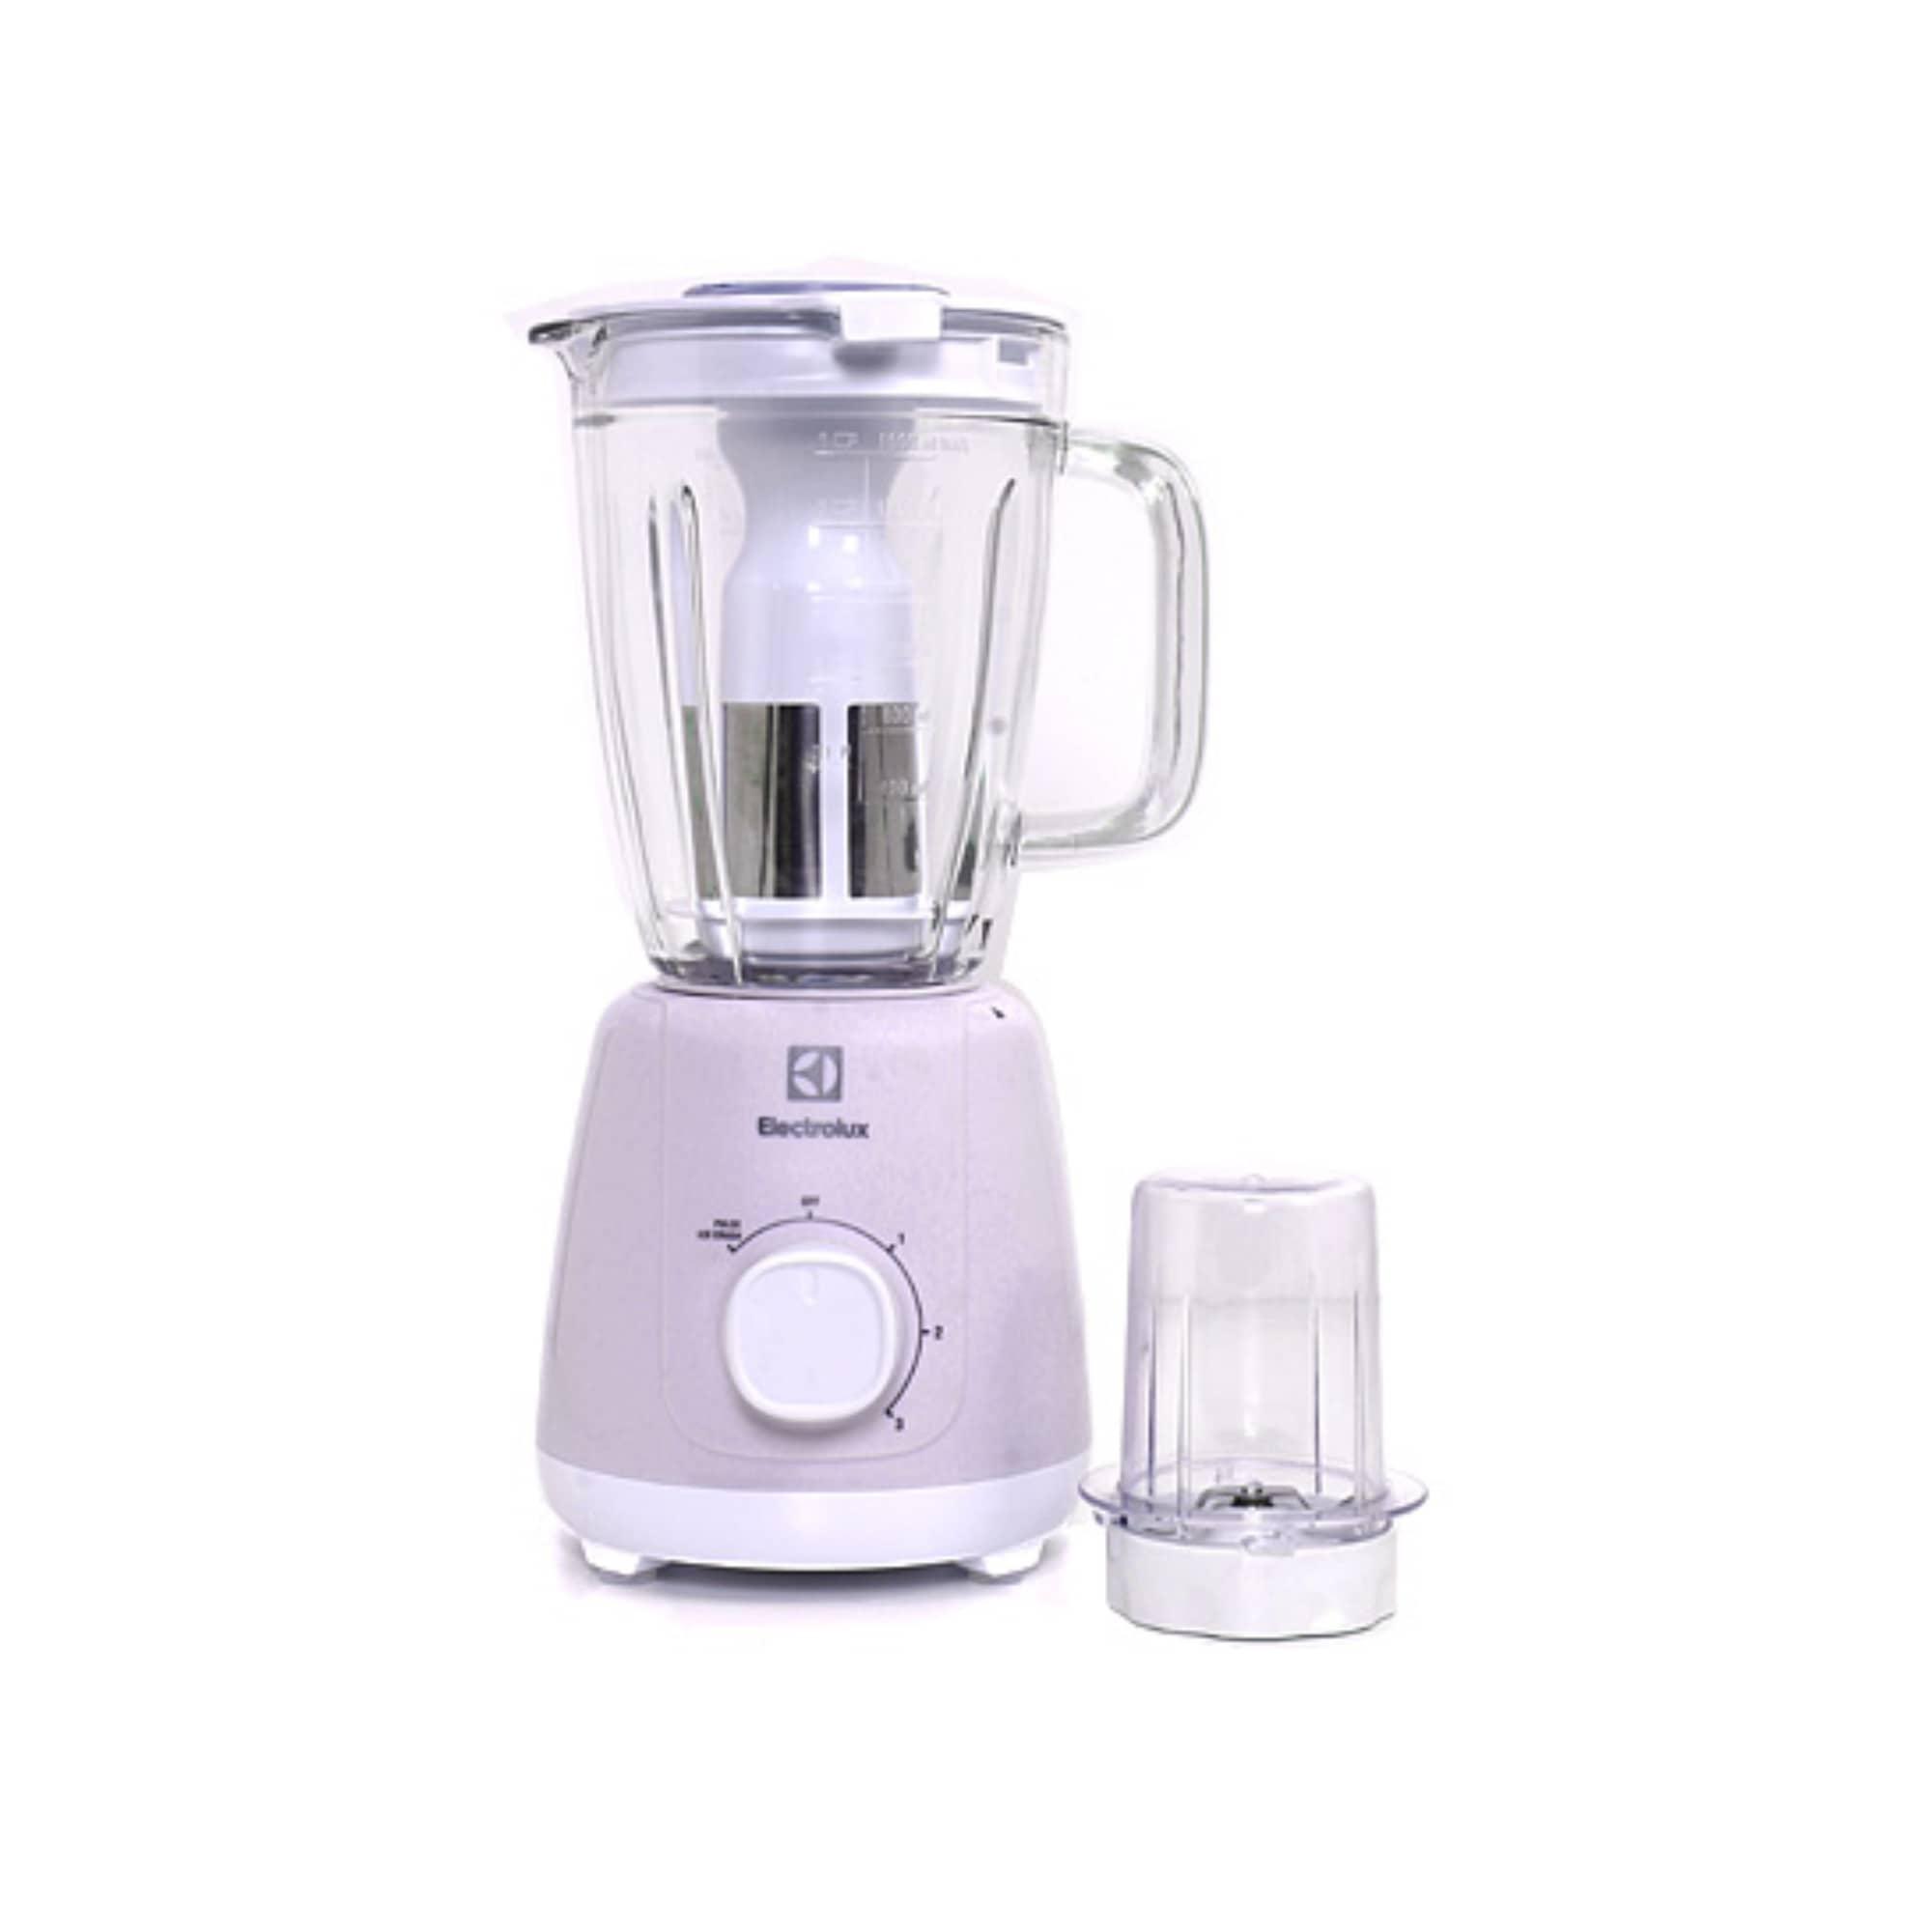 electrolux blender ebr3646 500w 1 7 end 5 2 2020 4 56 pm rh lelong com my KitchenAid Blender Samsung Washing Machine User Manual